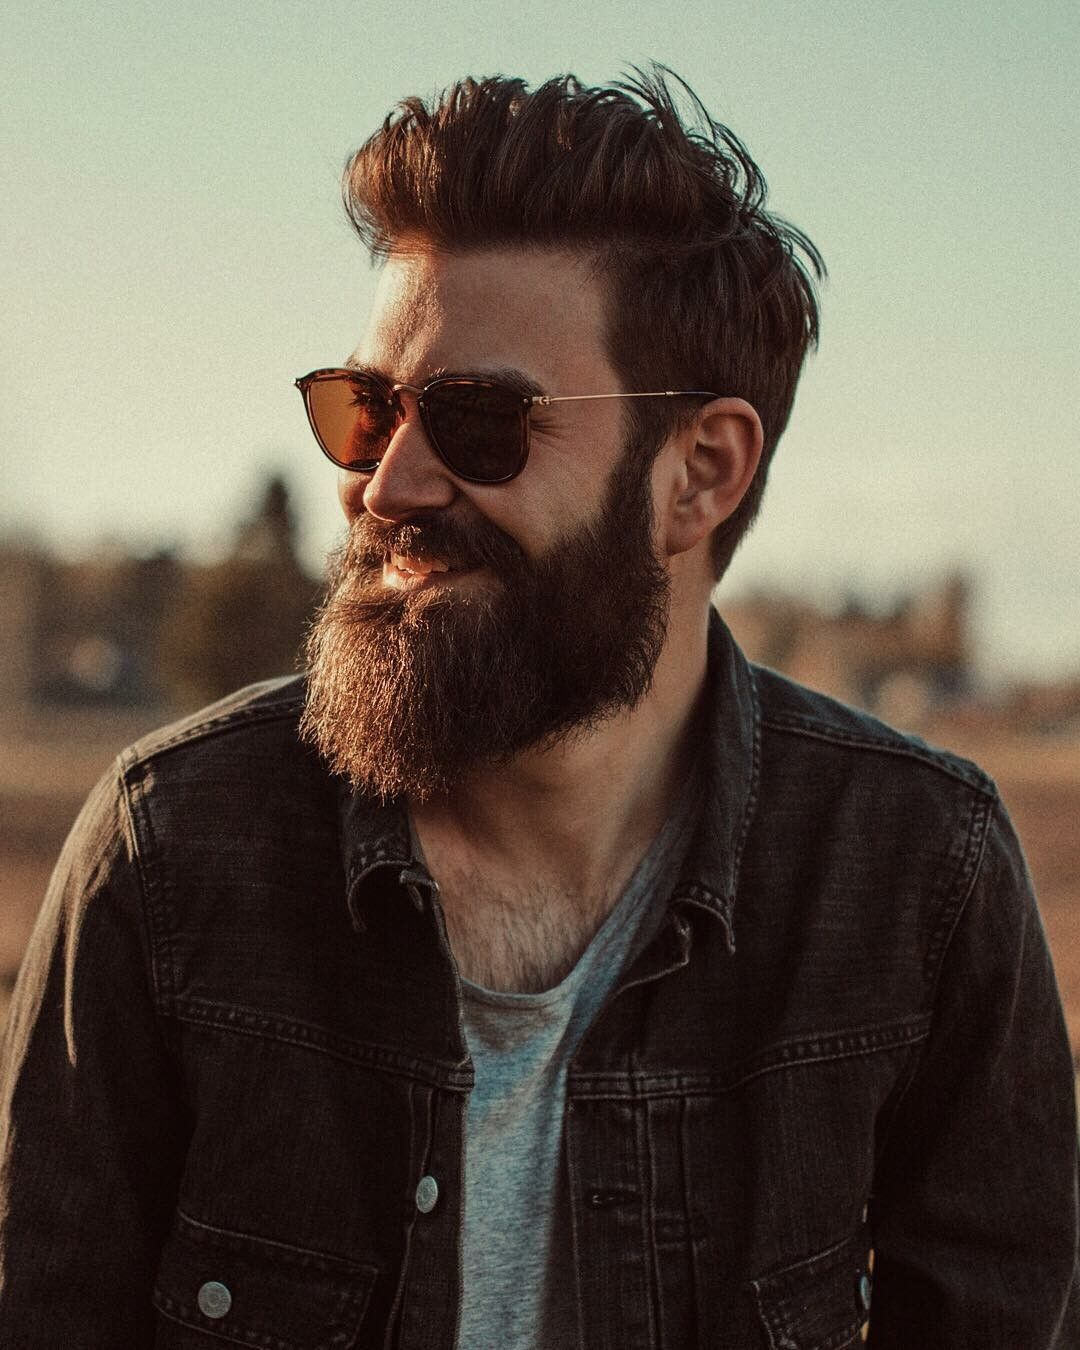 Slacker Black - Beard look for men s   Men s Fashion in 2019 ... dc82f26fe7ab